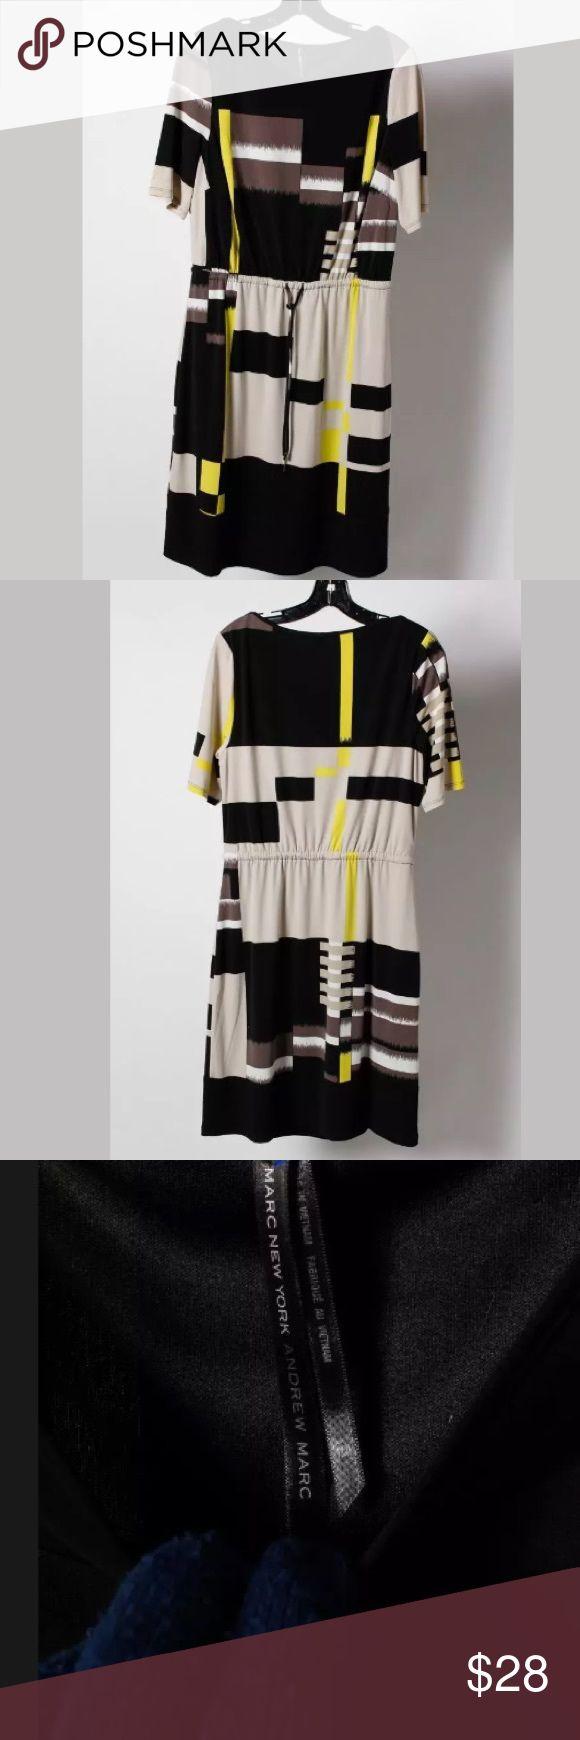 💛Andrew Marc New York drawstring waist dress💛 Great comfy dress for work! Andrew Marc Dresses Midi